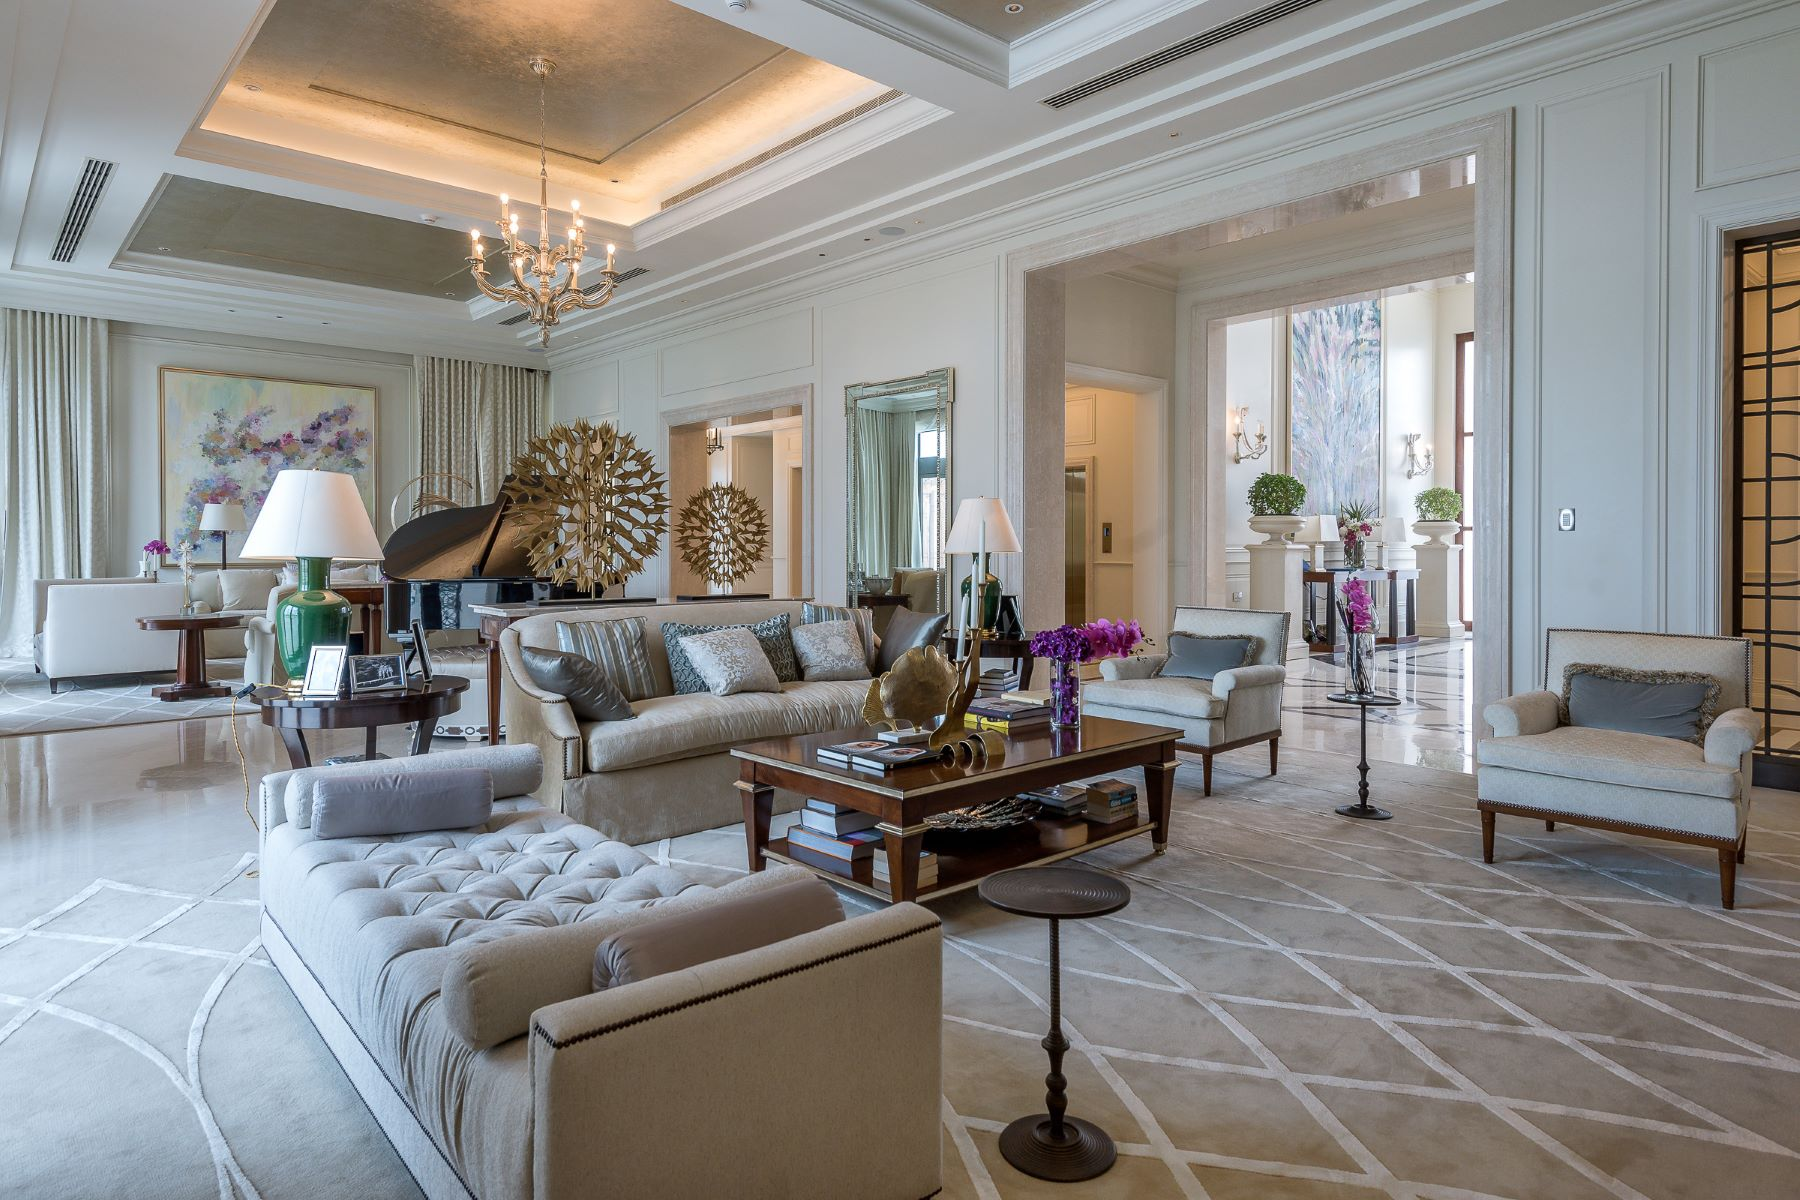 独户住宅 为 销售 在 Contemporary Arabesque Mansion 迪拜, 阿联酋